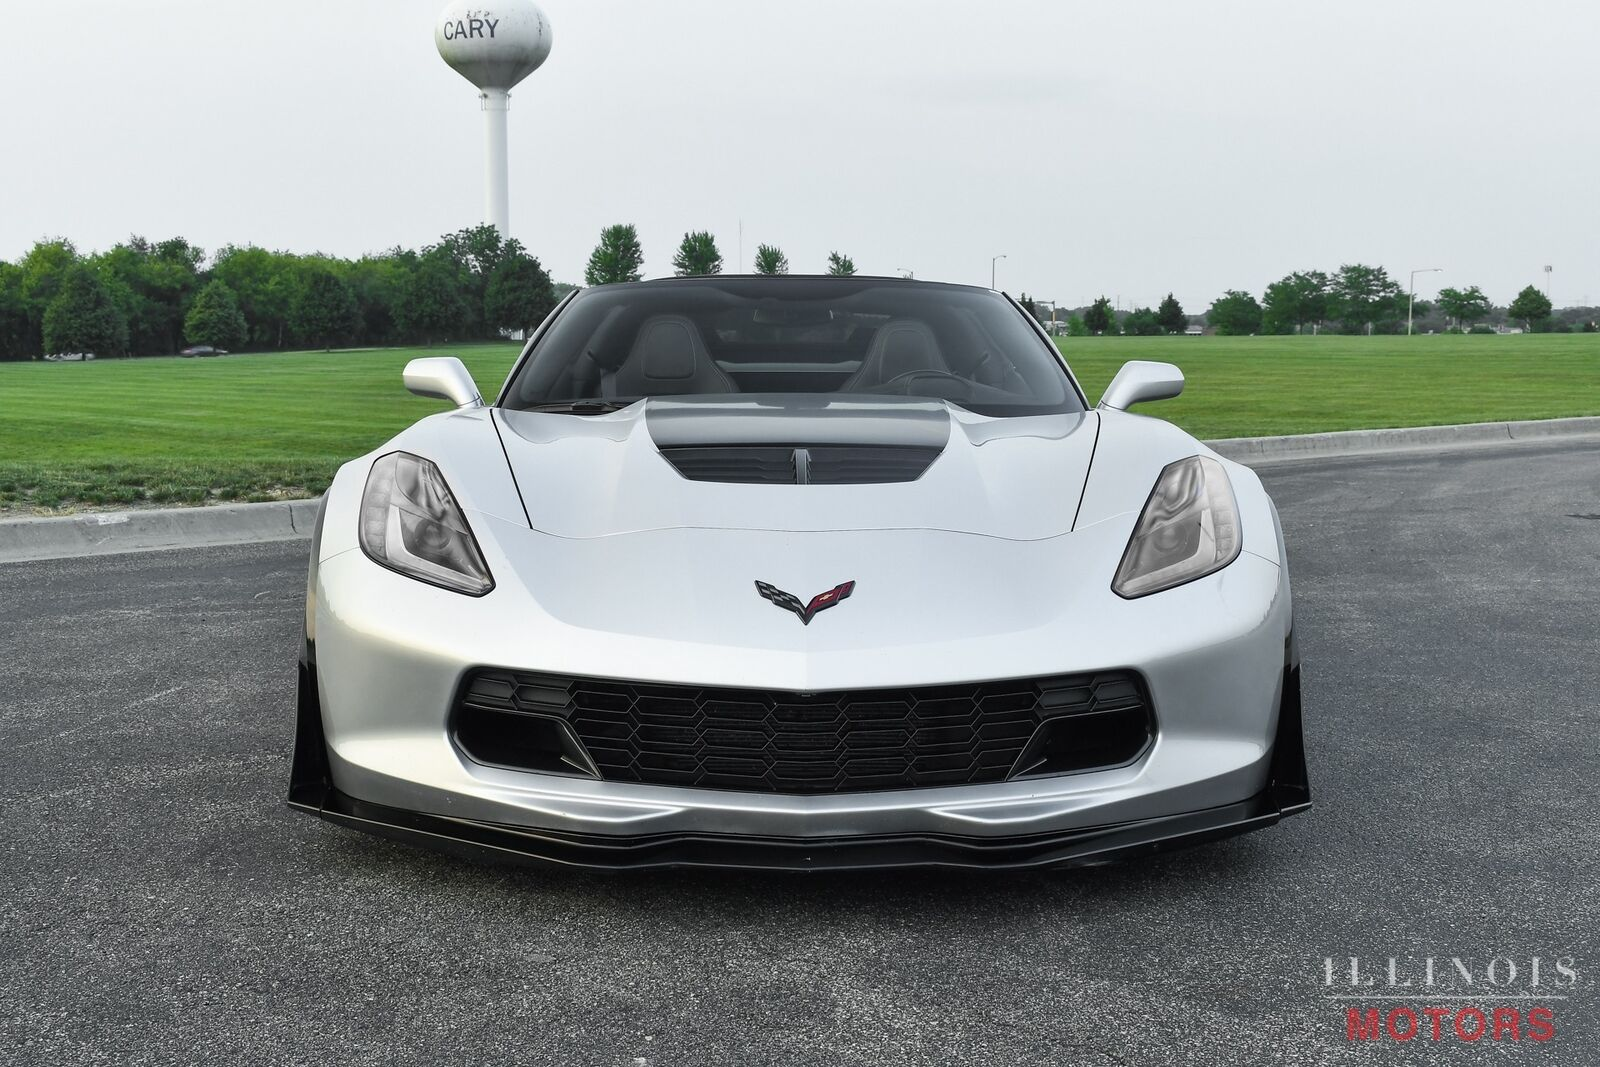 2015 Silver Chevrolet Corvette Z06  | C7 Corvette Photo 9